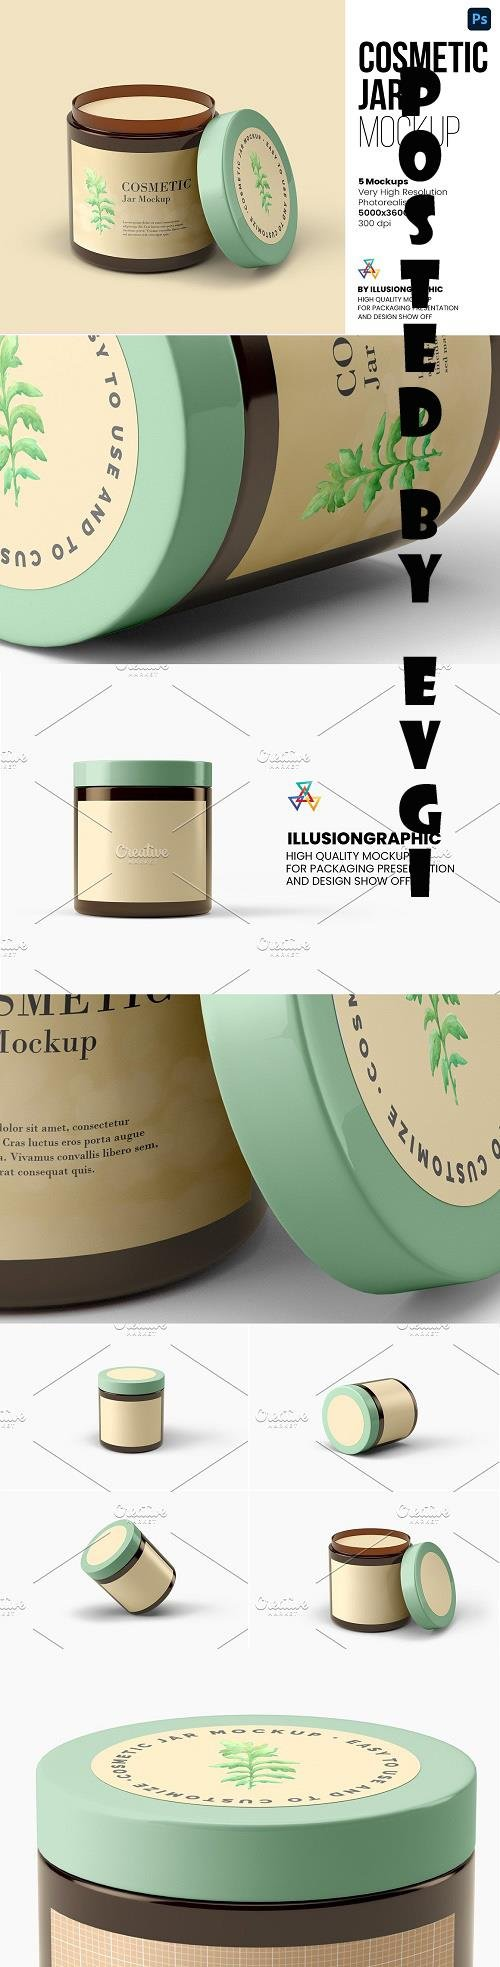 Cosmetic Jar Mockup - 5 views - 6295368